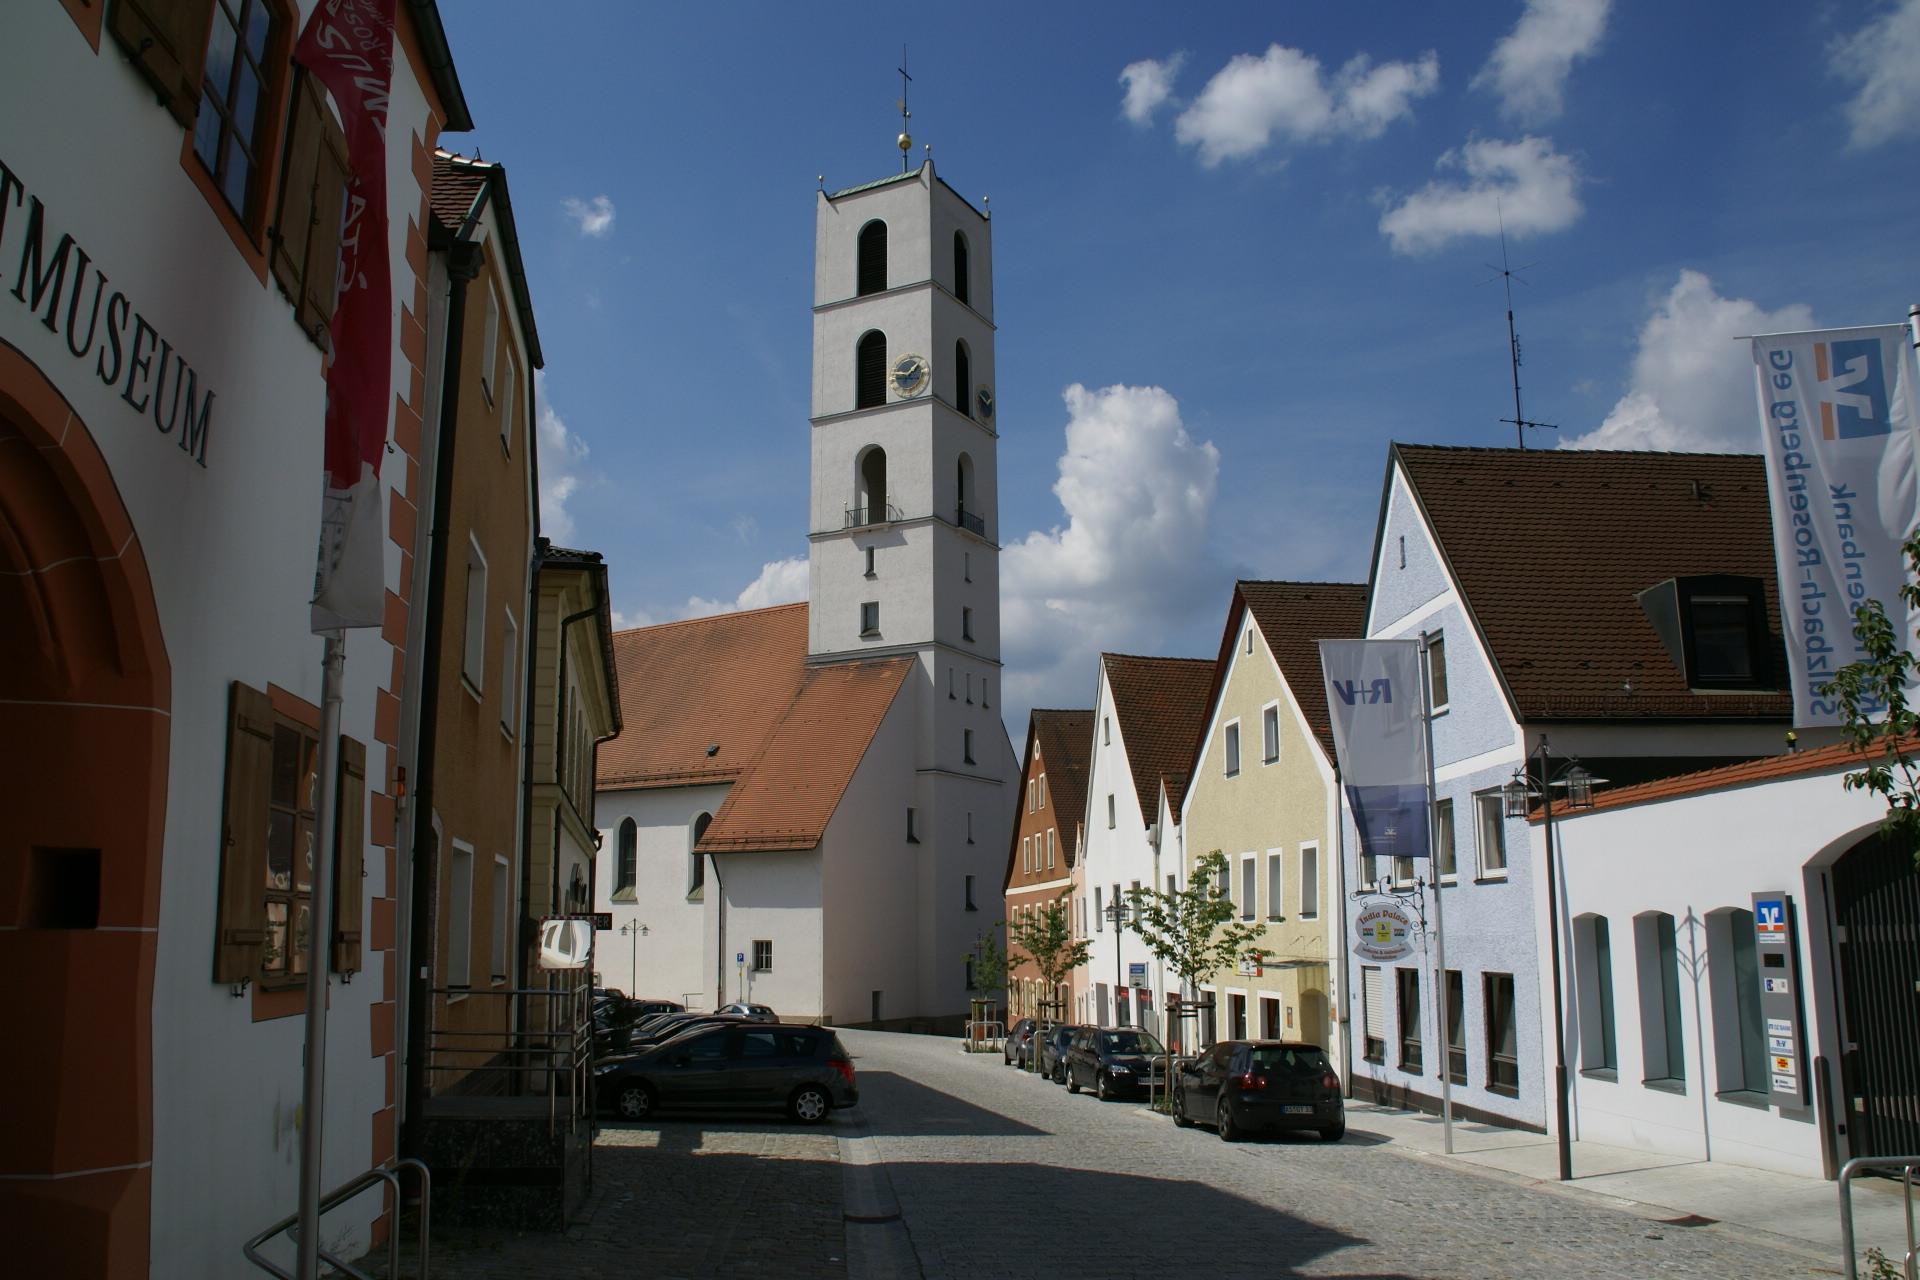 Maxhütte Sulzbach-Rosenberg